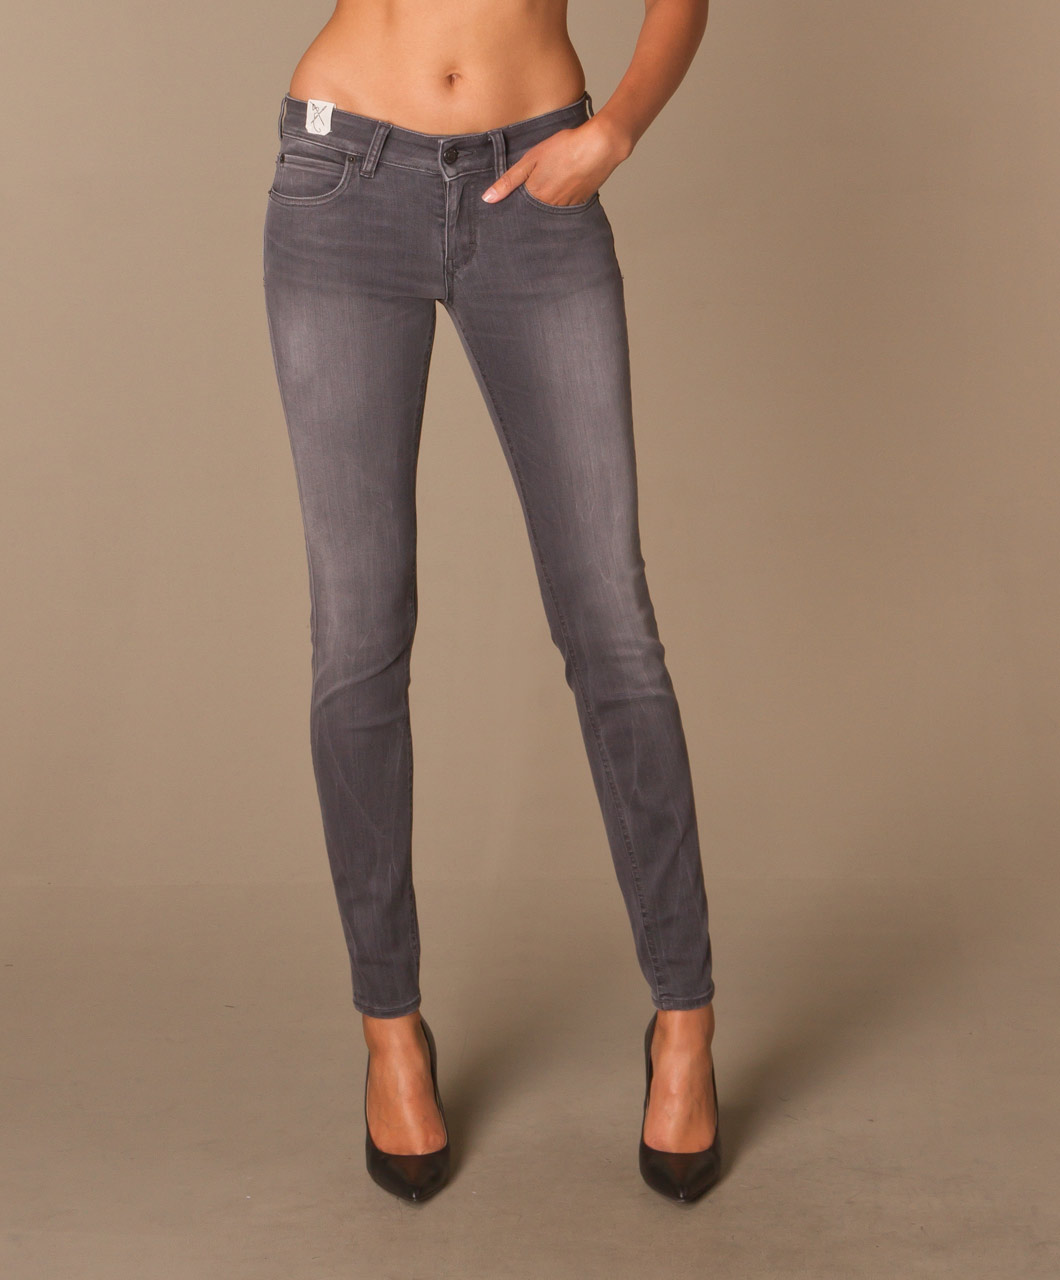 Mens True Religion Jeans For Cheap